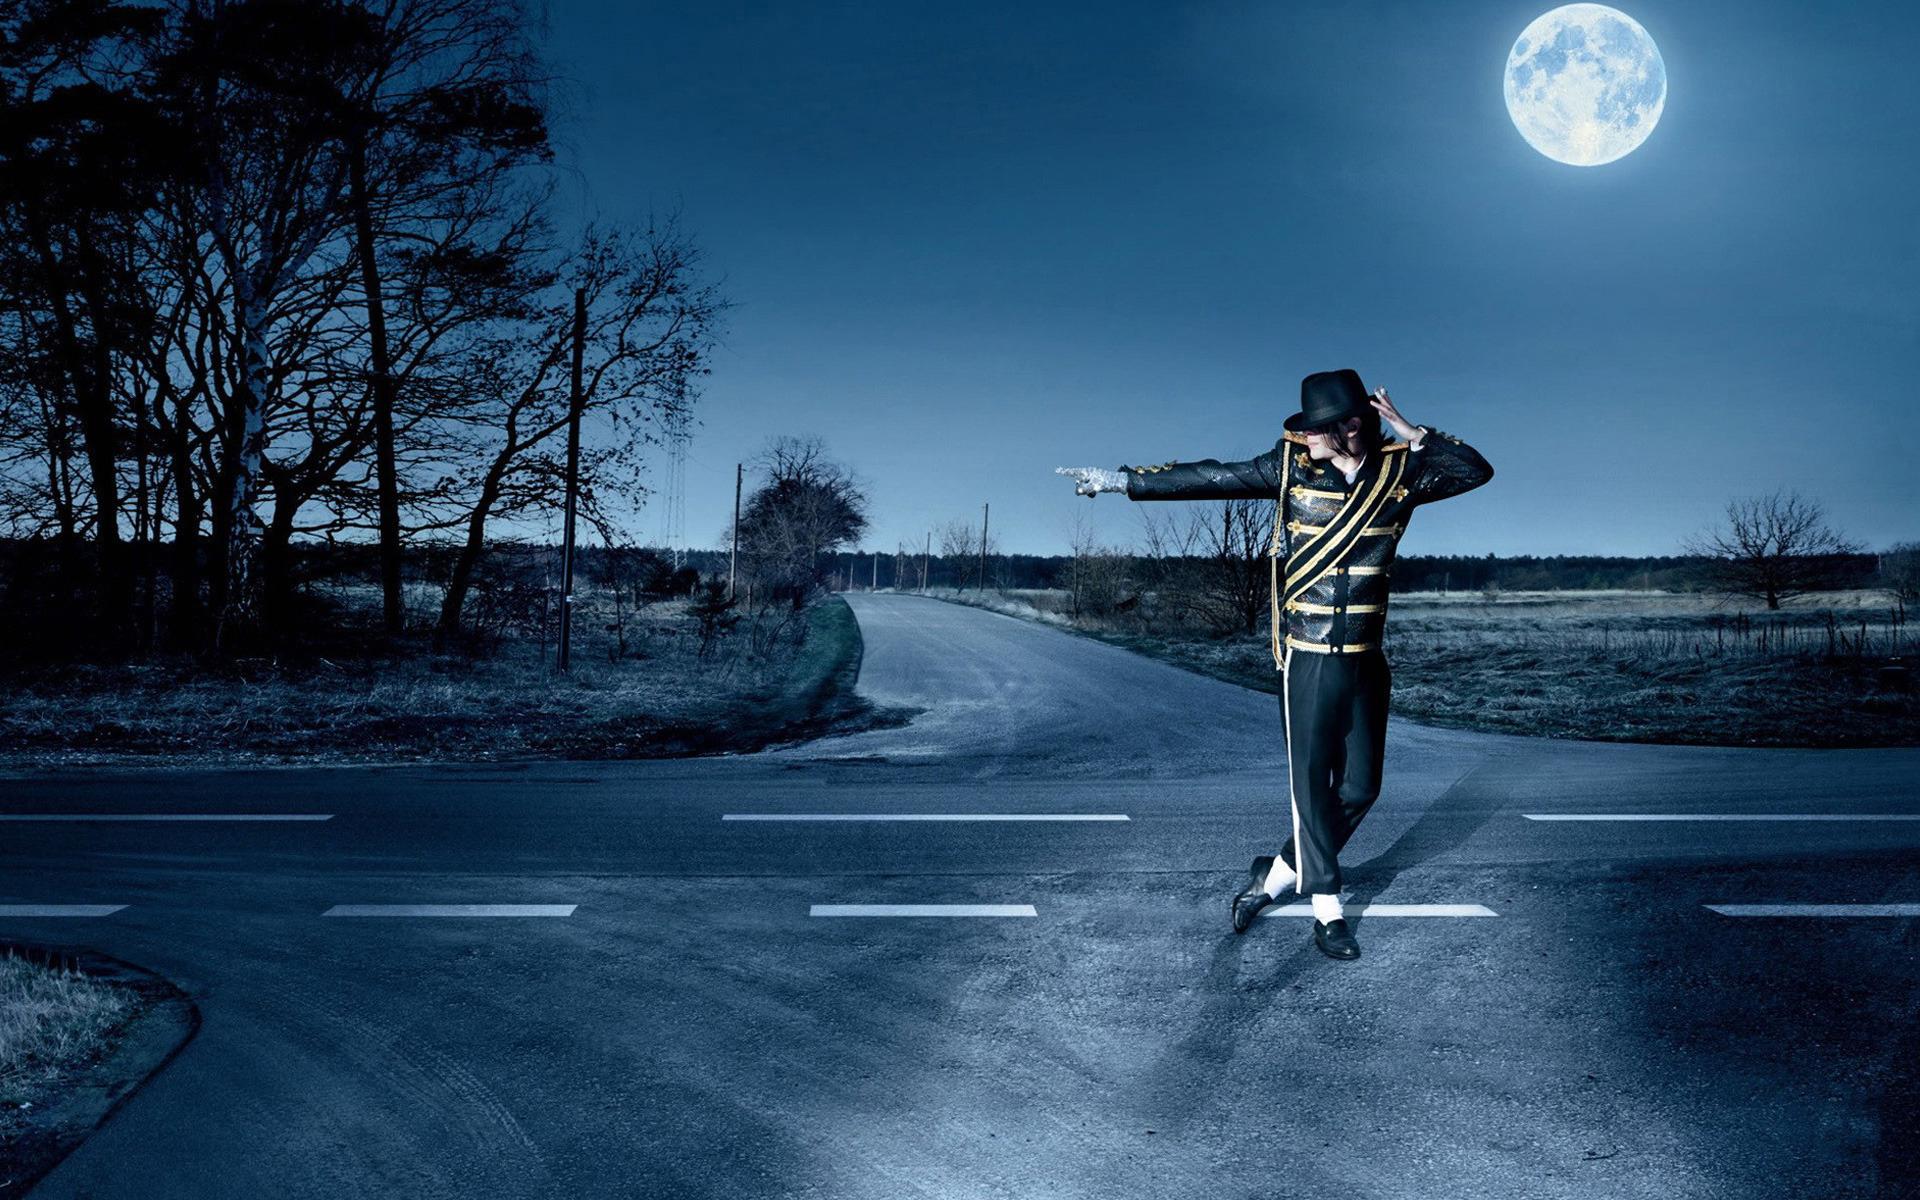 Fall Out Boy Quotes Iphone Wallpaper Michael Jackson Wallpaper Hd Pixelstalk Net